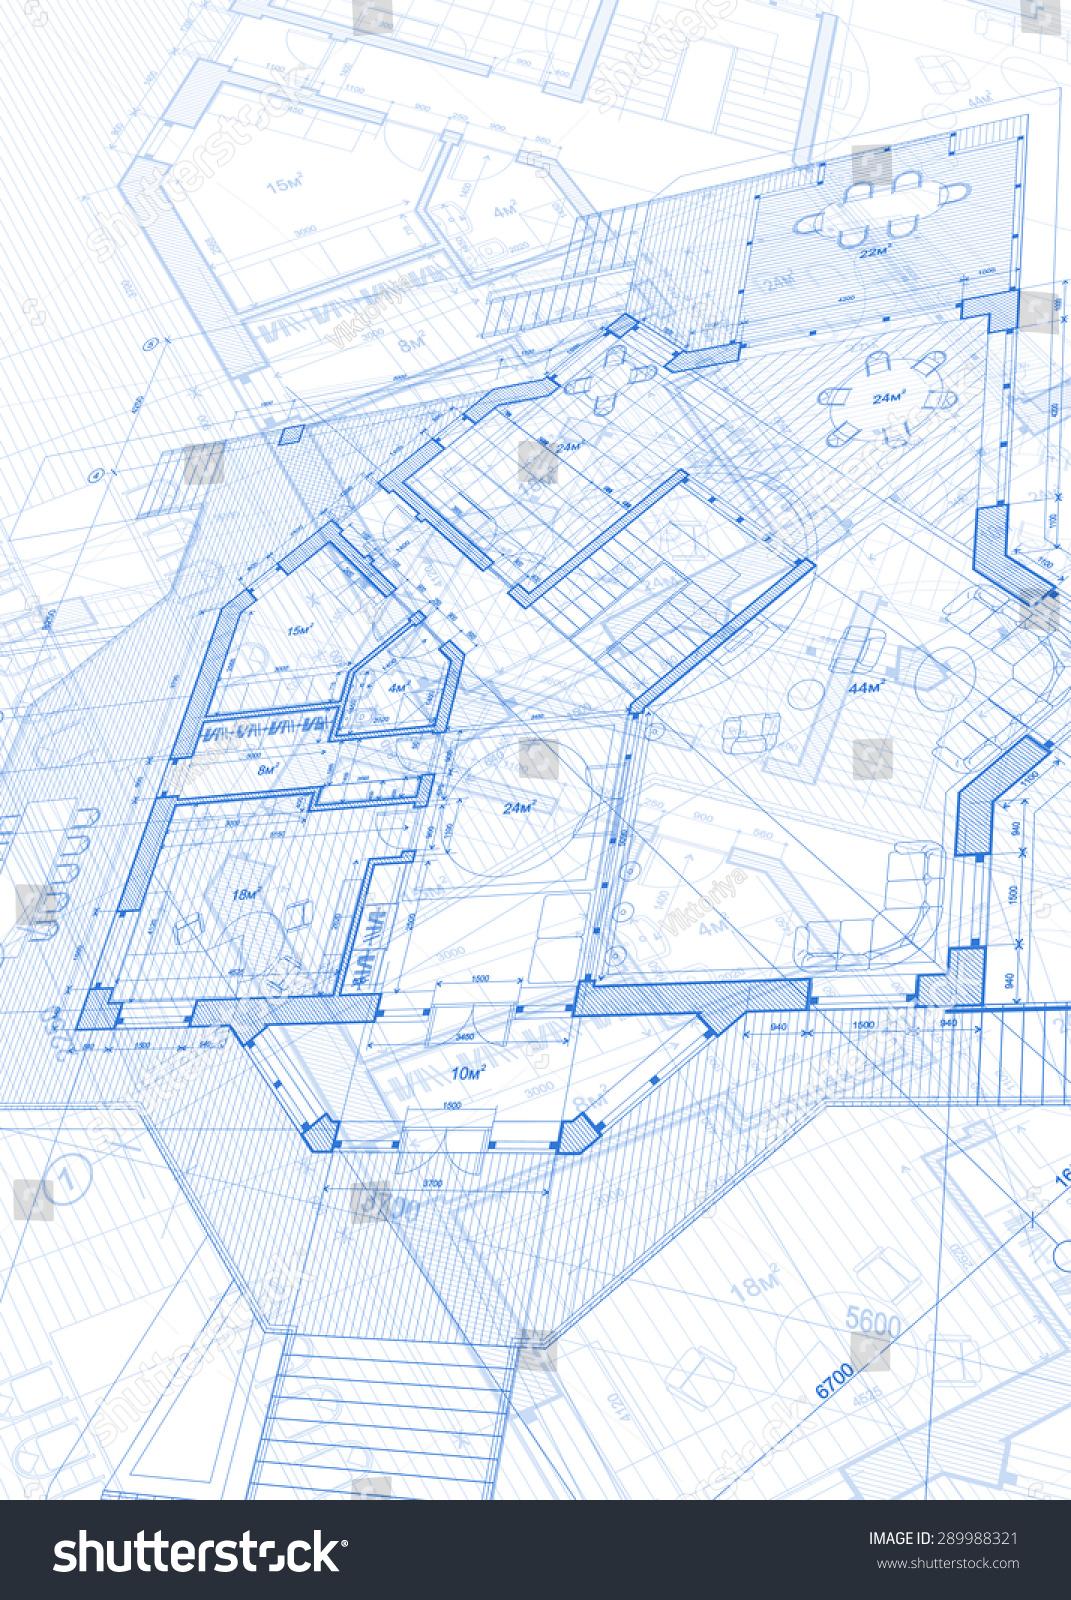 Architecture Design Blueprint Vector Illustration Stock